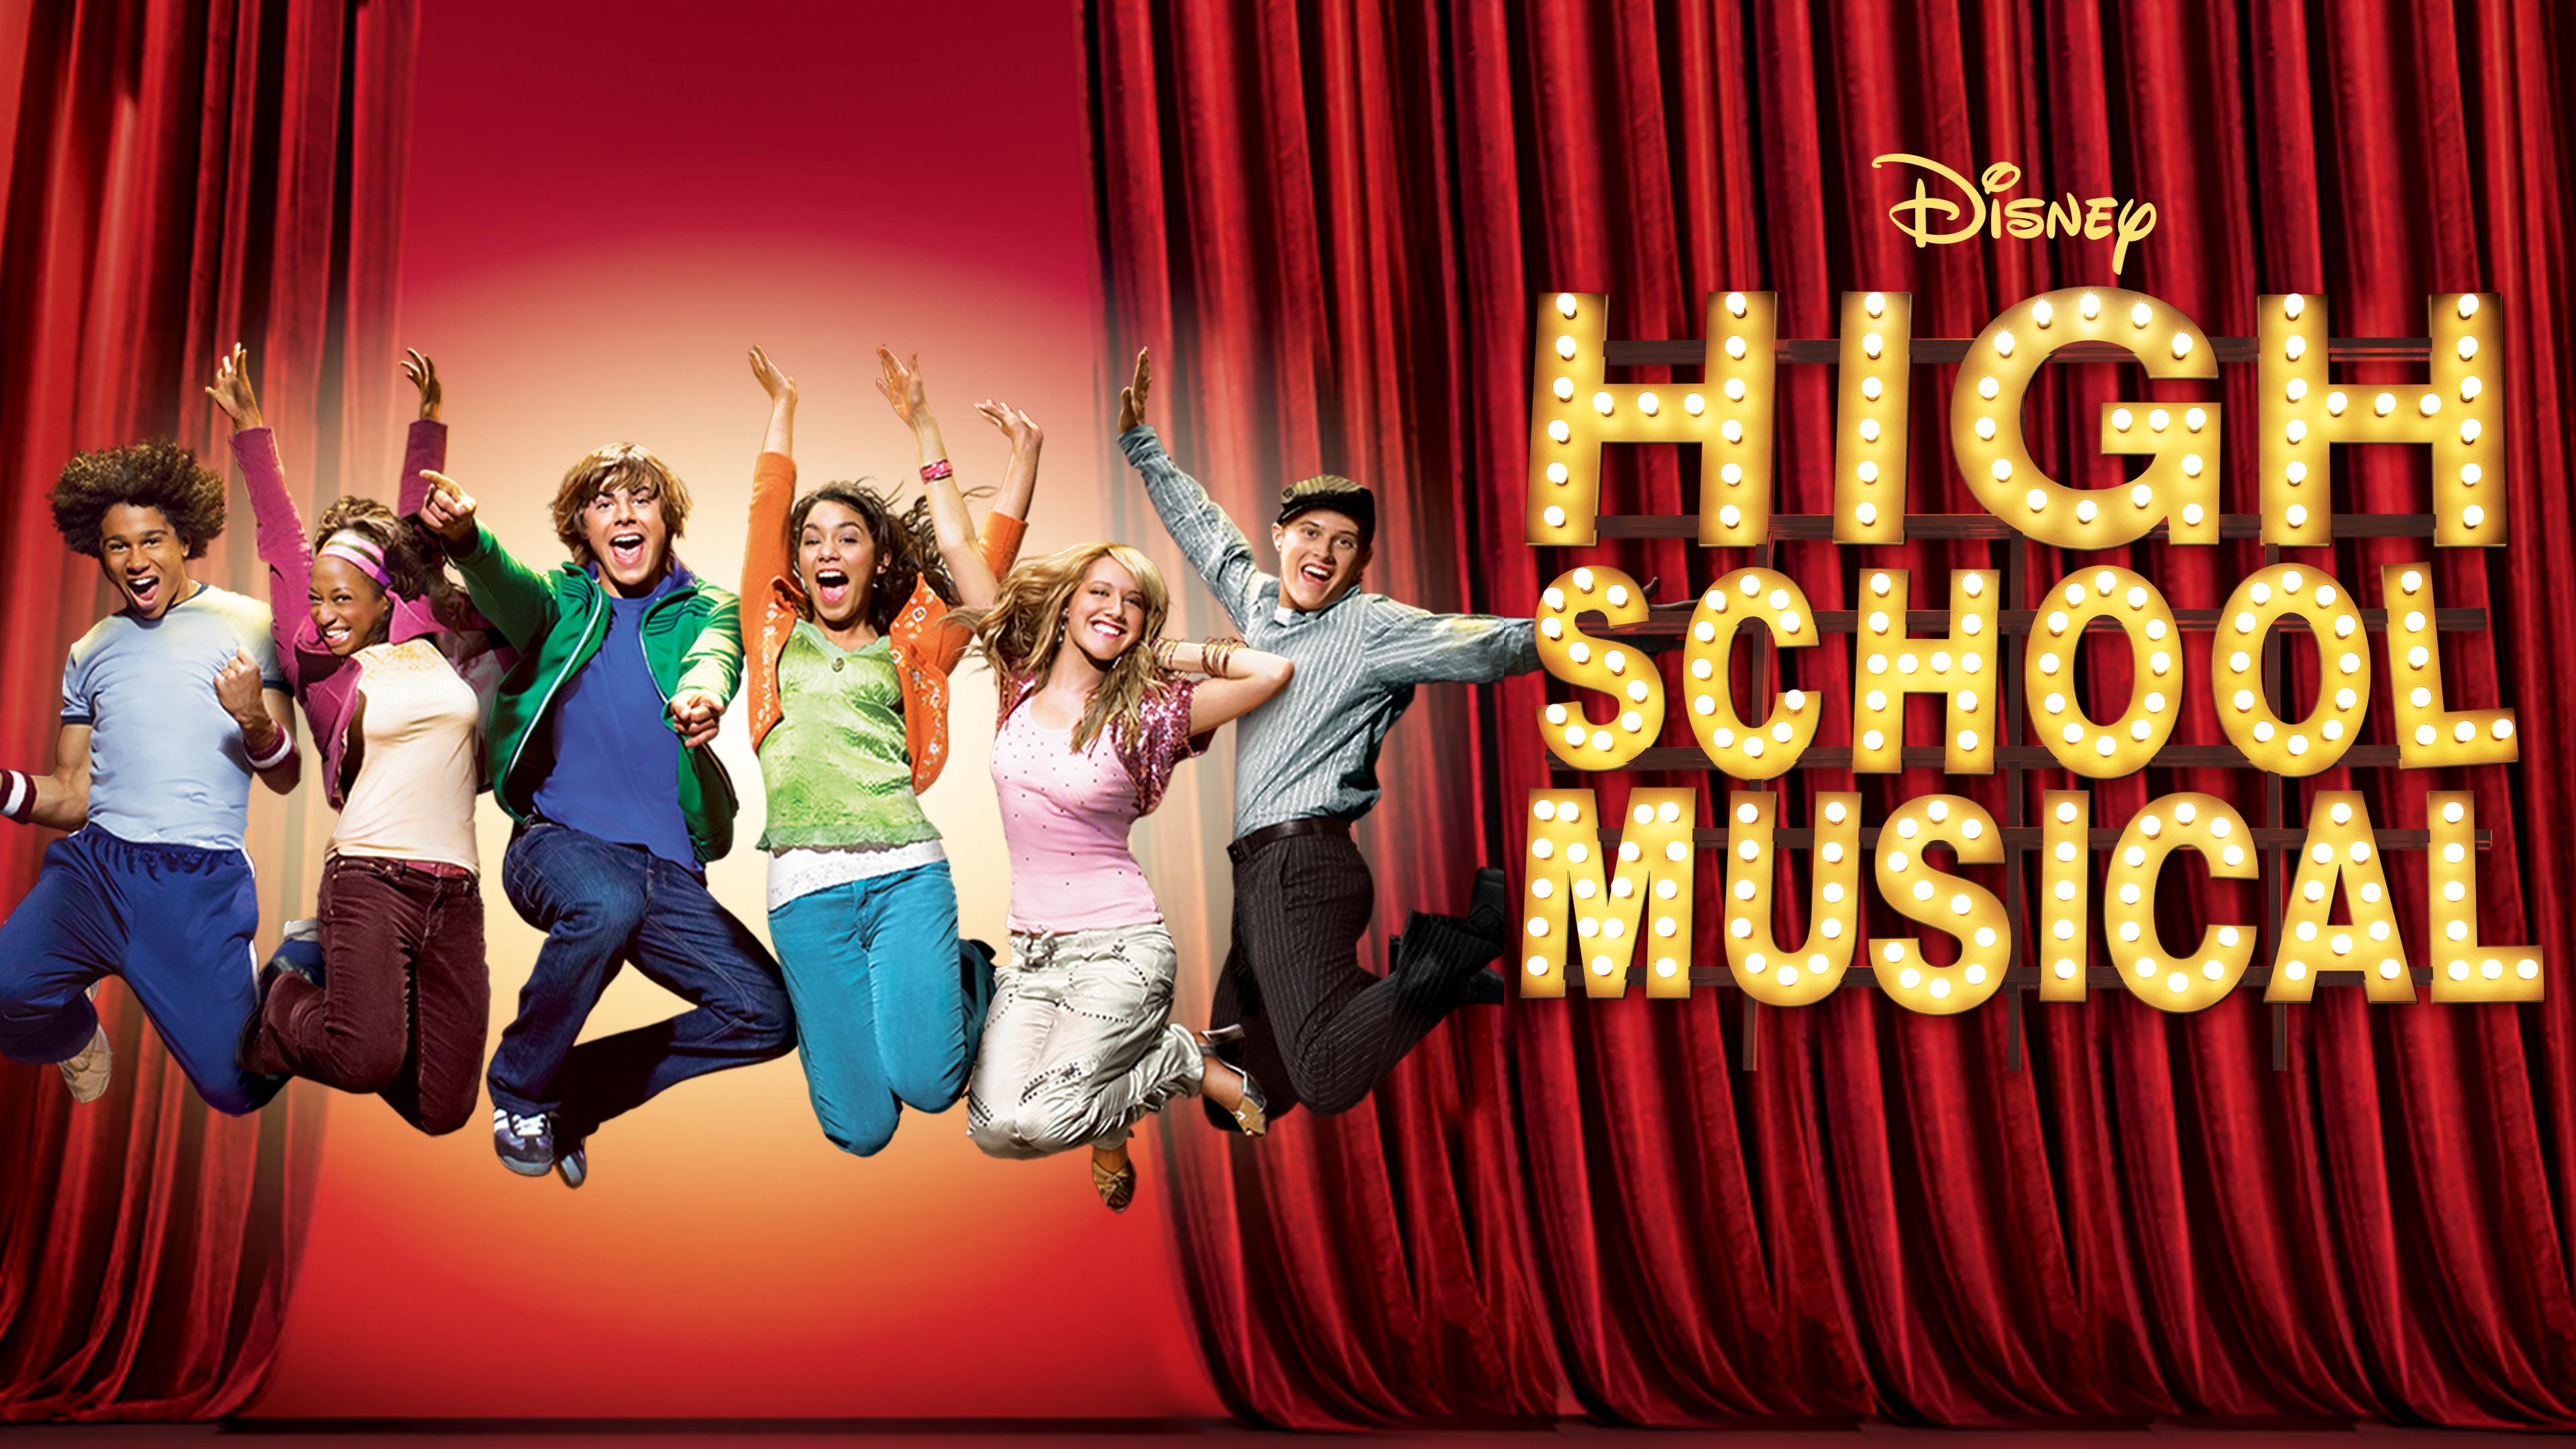 Watch High School Musical | Full Movie | Disney+